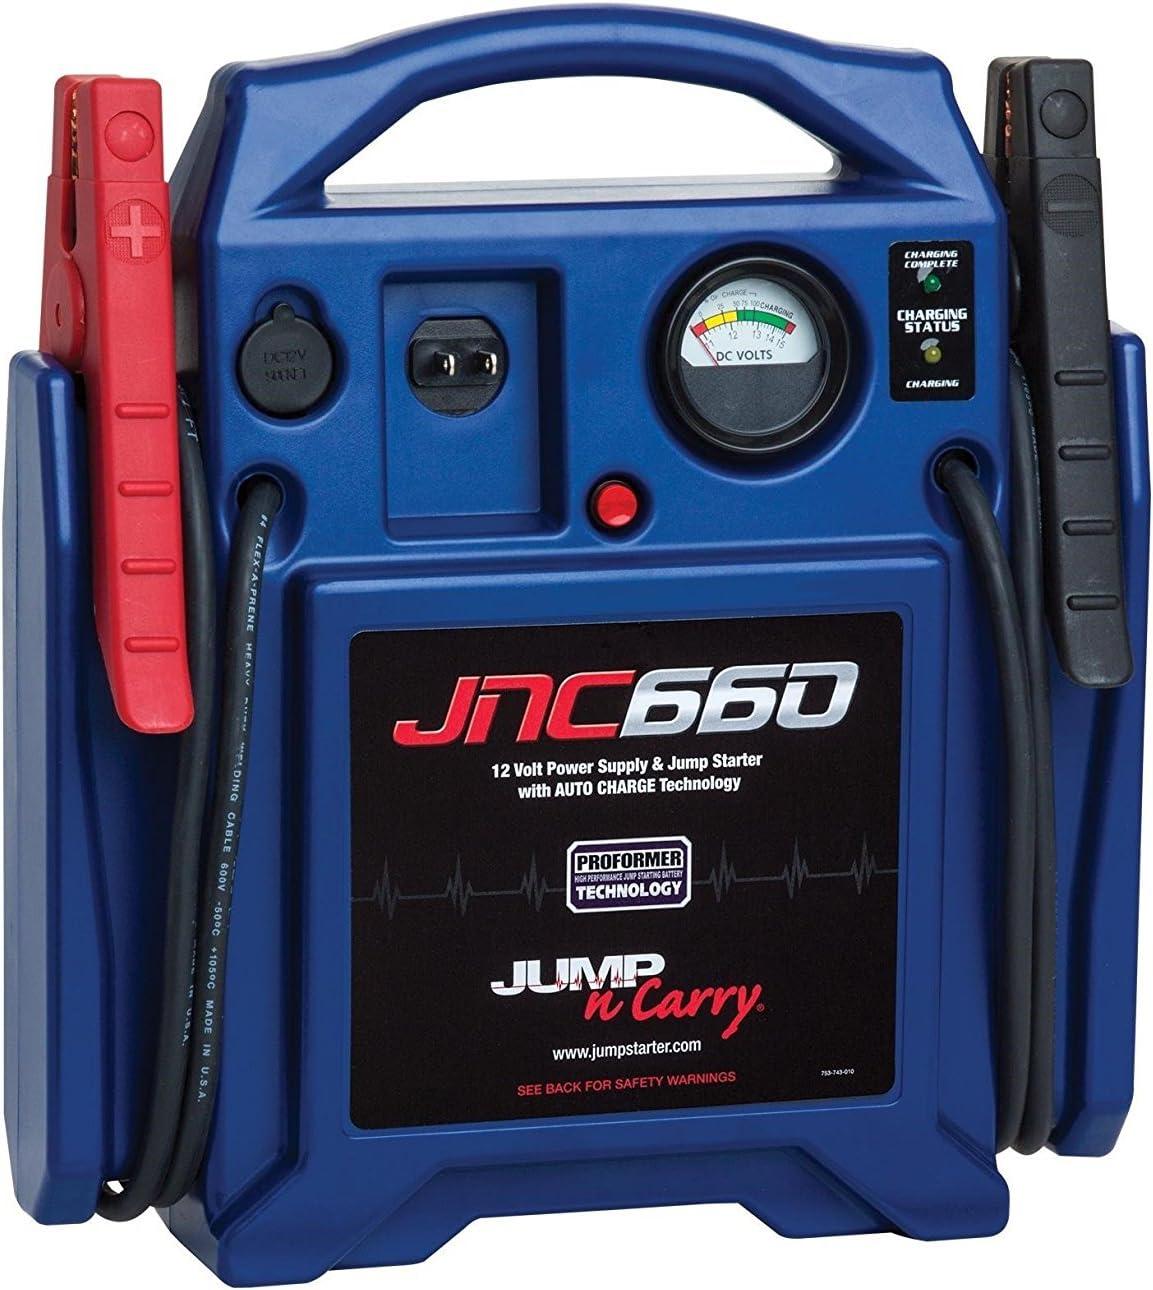 Clore Automotive JNC660 1700 Peak Amp 12 Volt Jump Starter